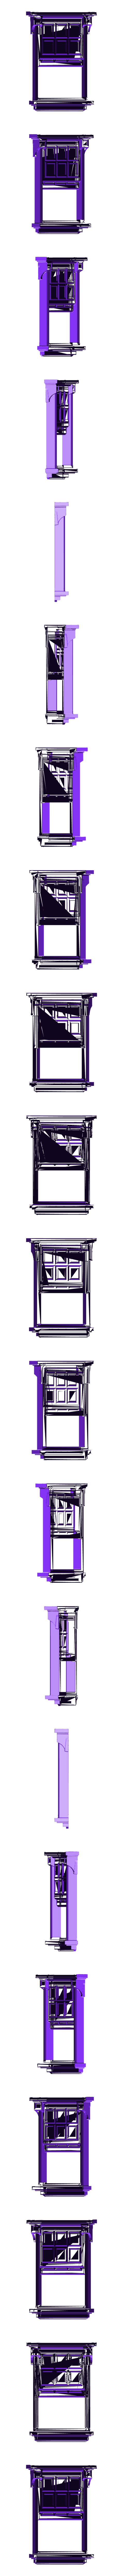 modernwindow8.stl Download free STL file Doors and windows terrain kitbash kit • 3D printing template, HeribertoValle